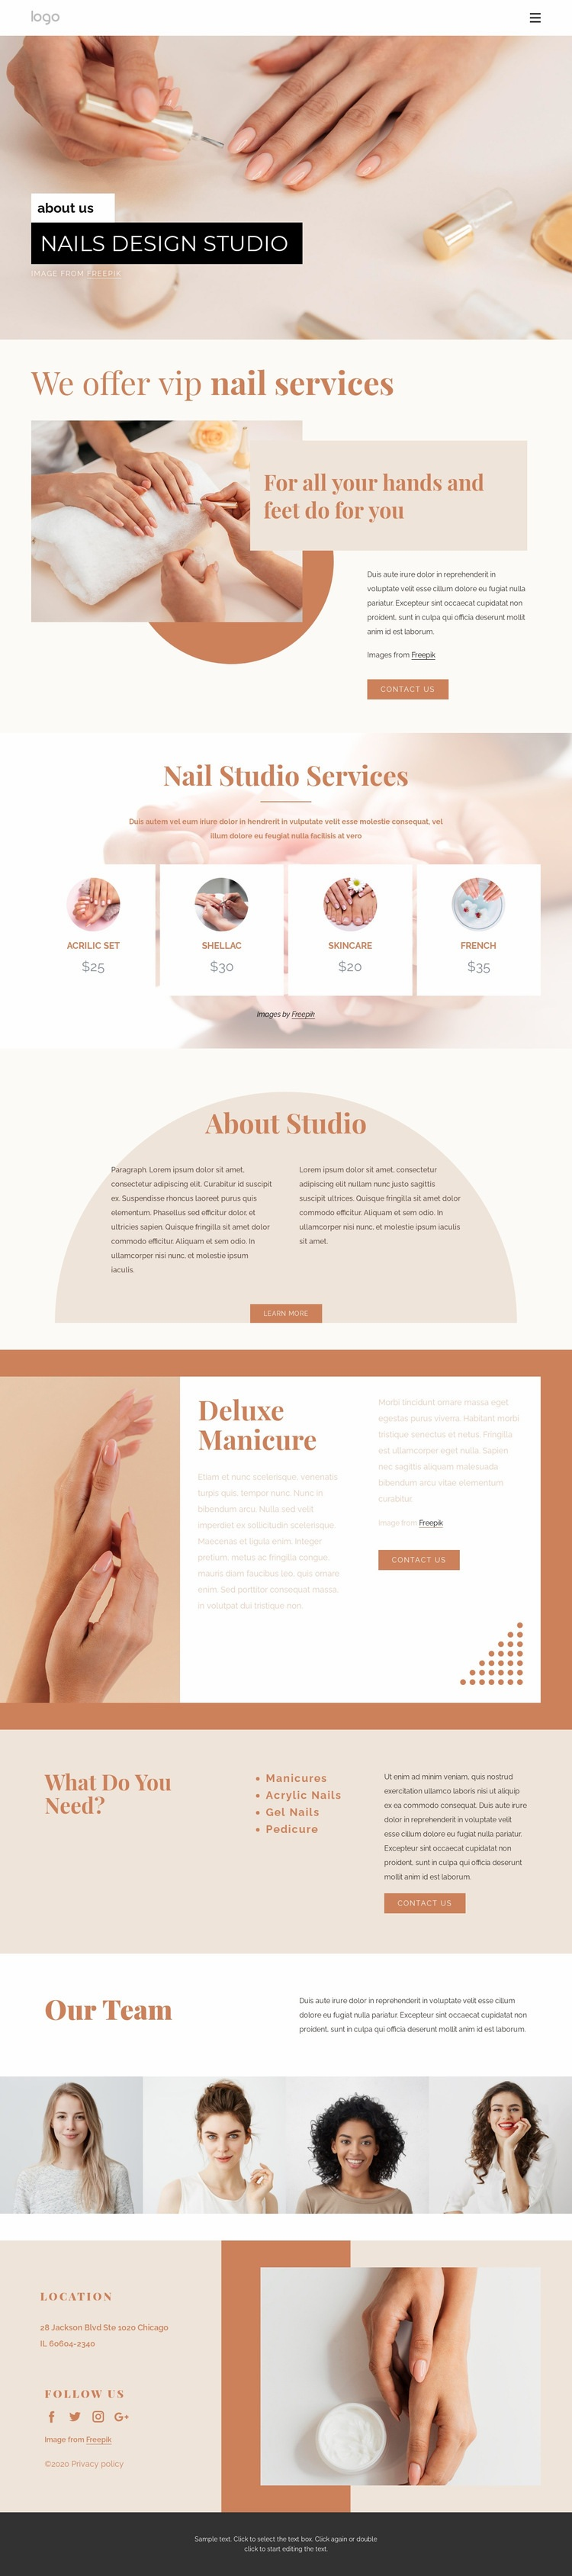 Professional nail art Web Page Design